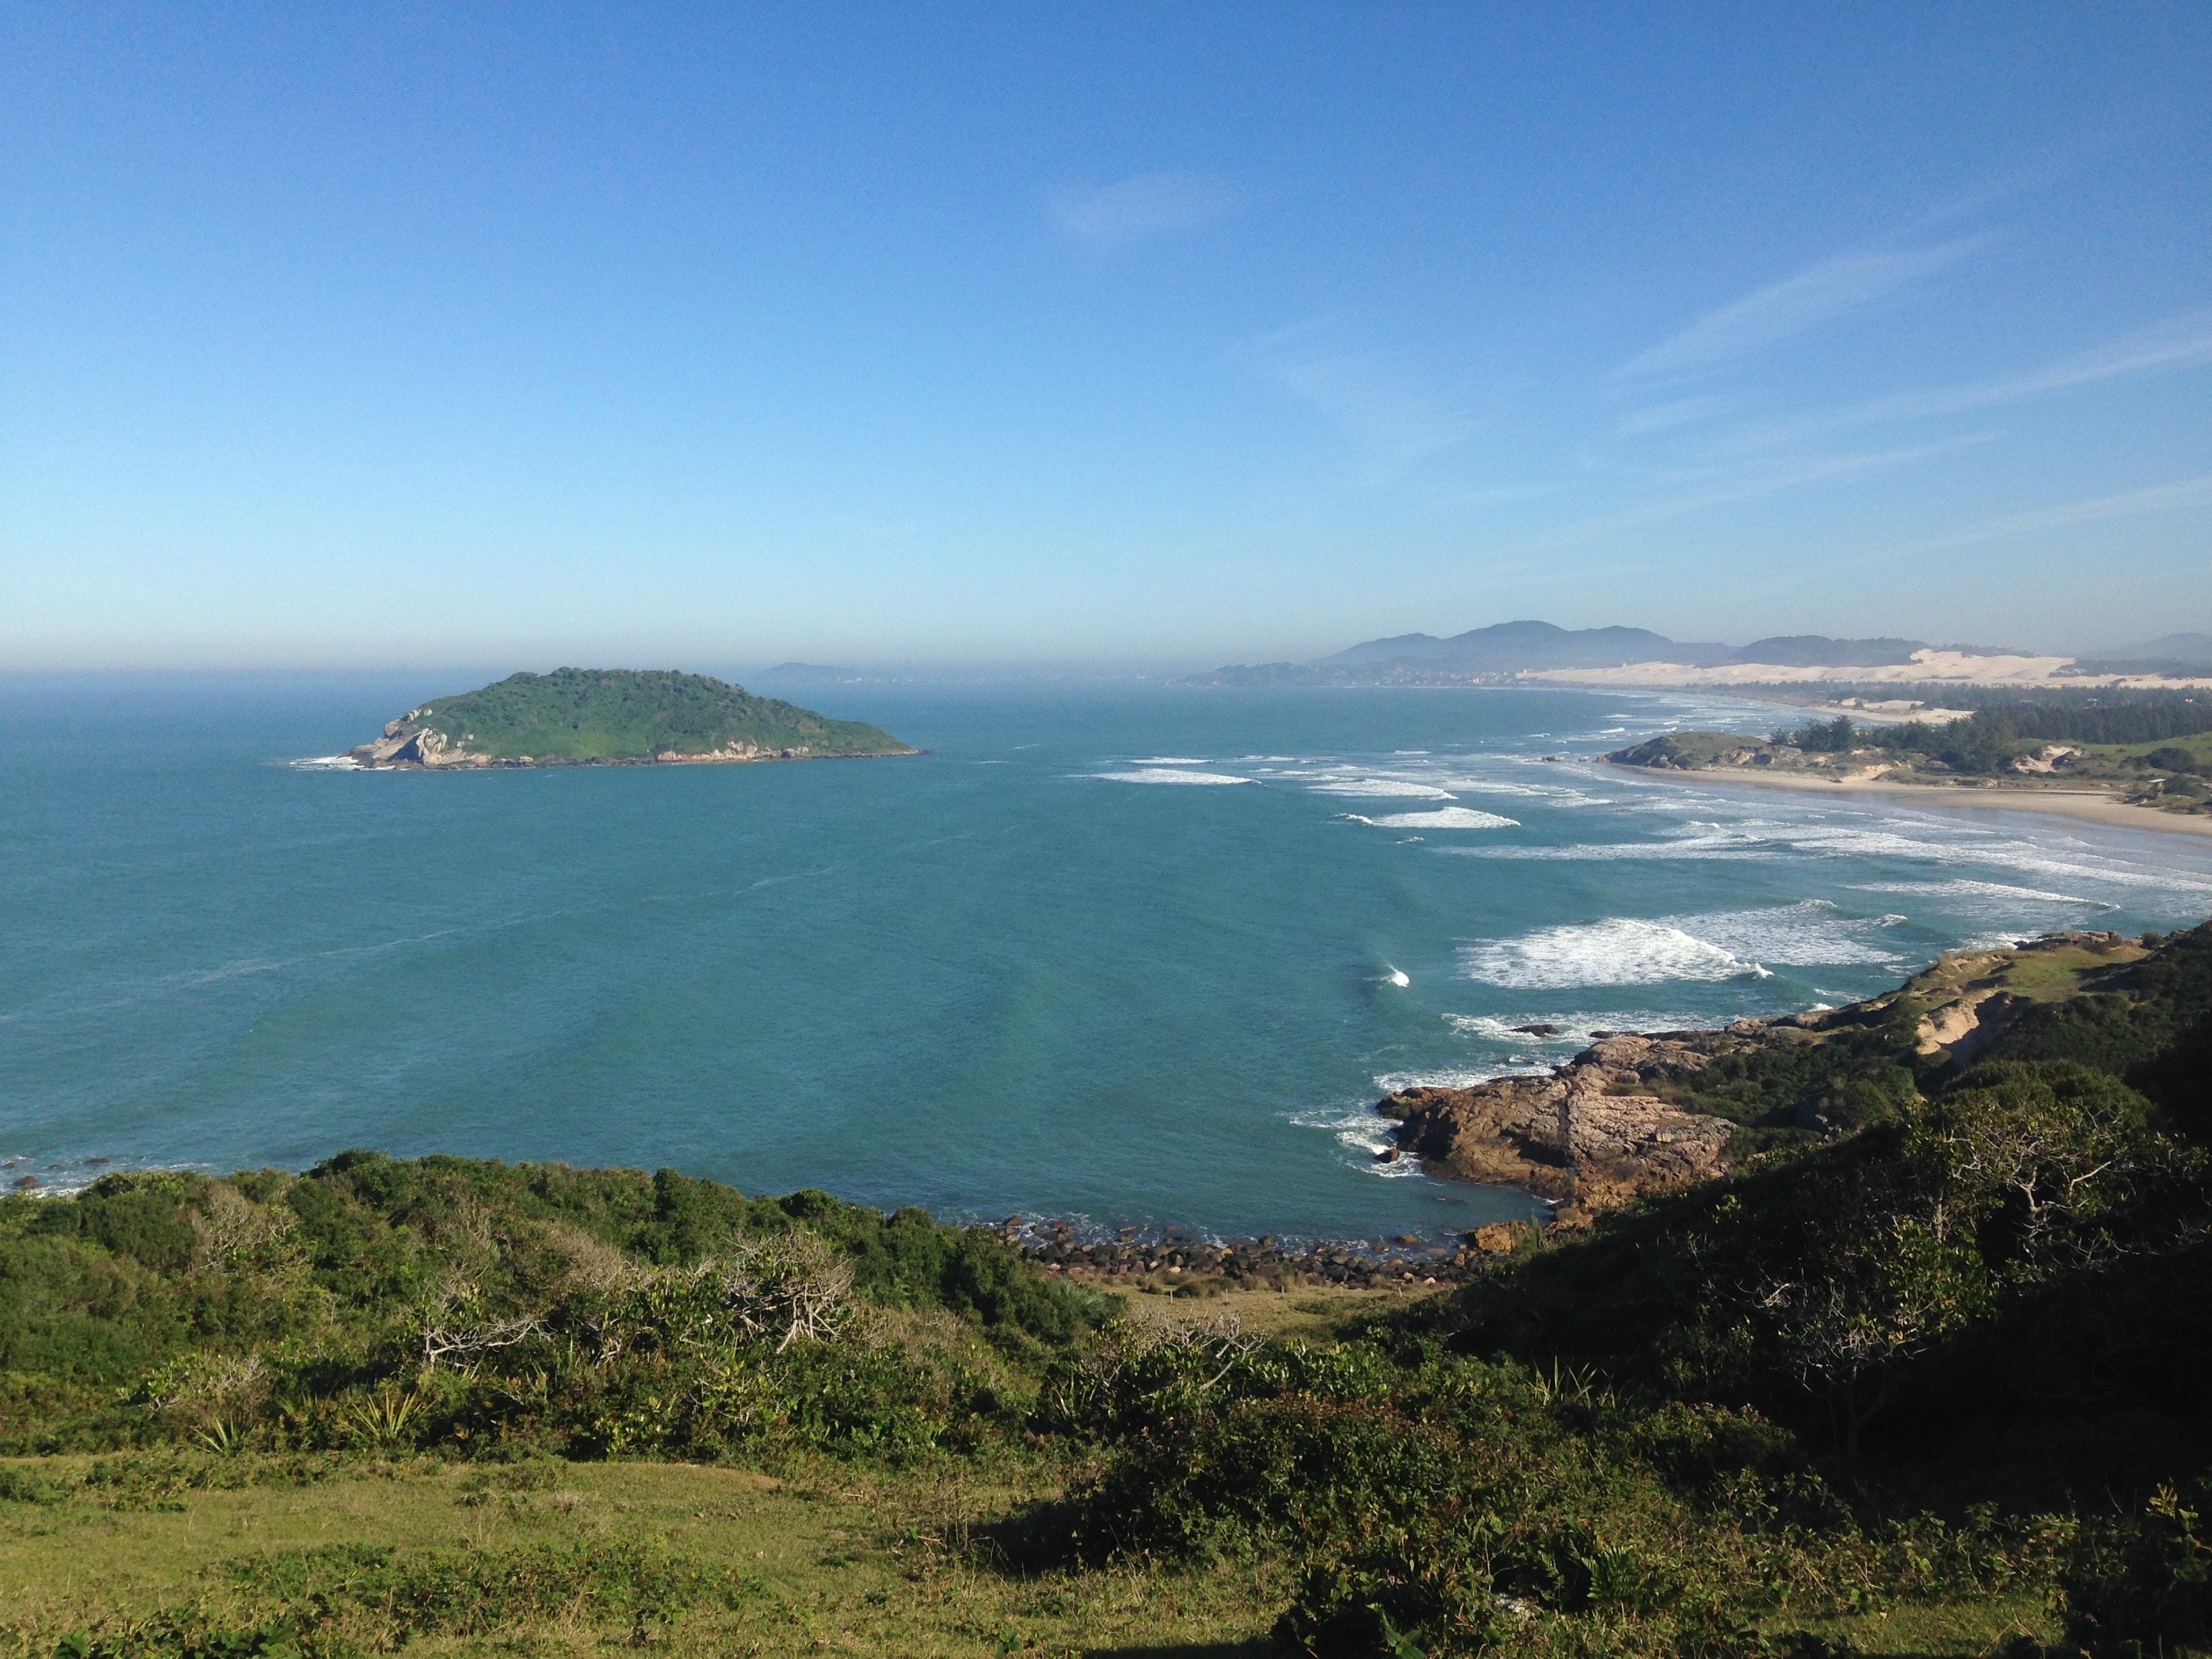 Praia do Luz vista do Alto da trilha